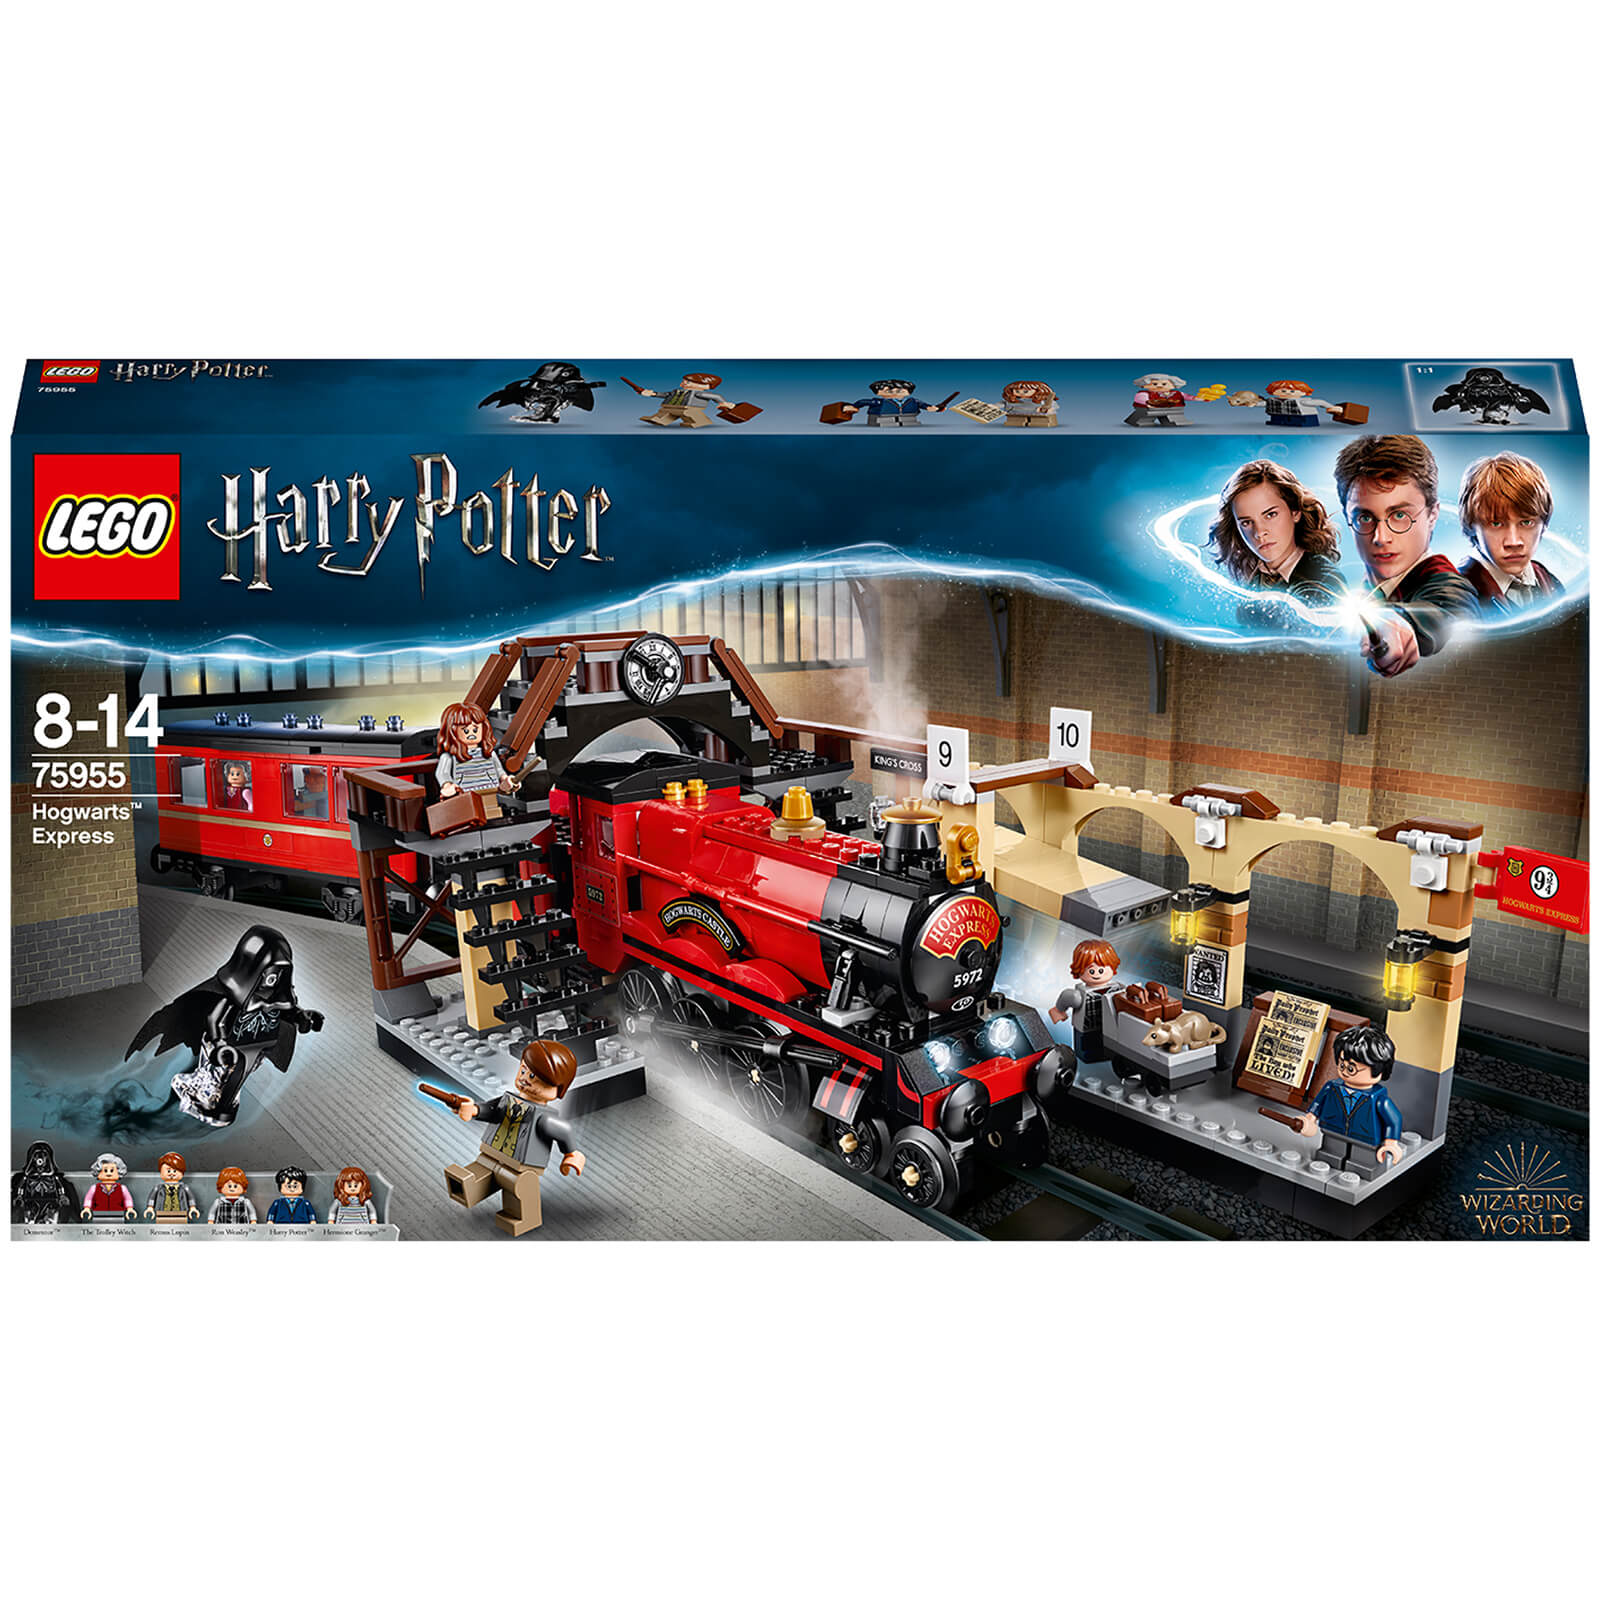 LEGO Harry Potter: Hogwarts Express Train Toy (75955)